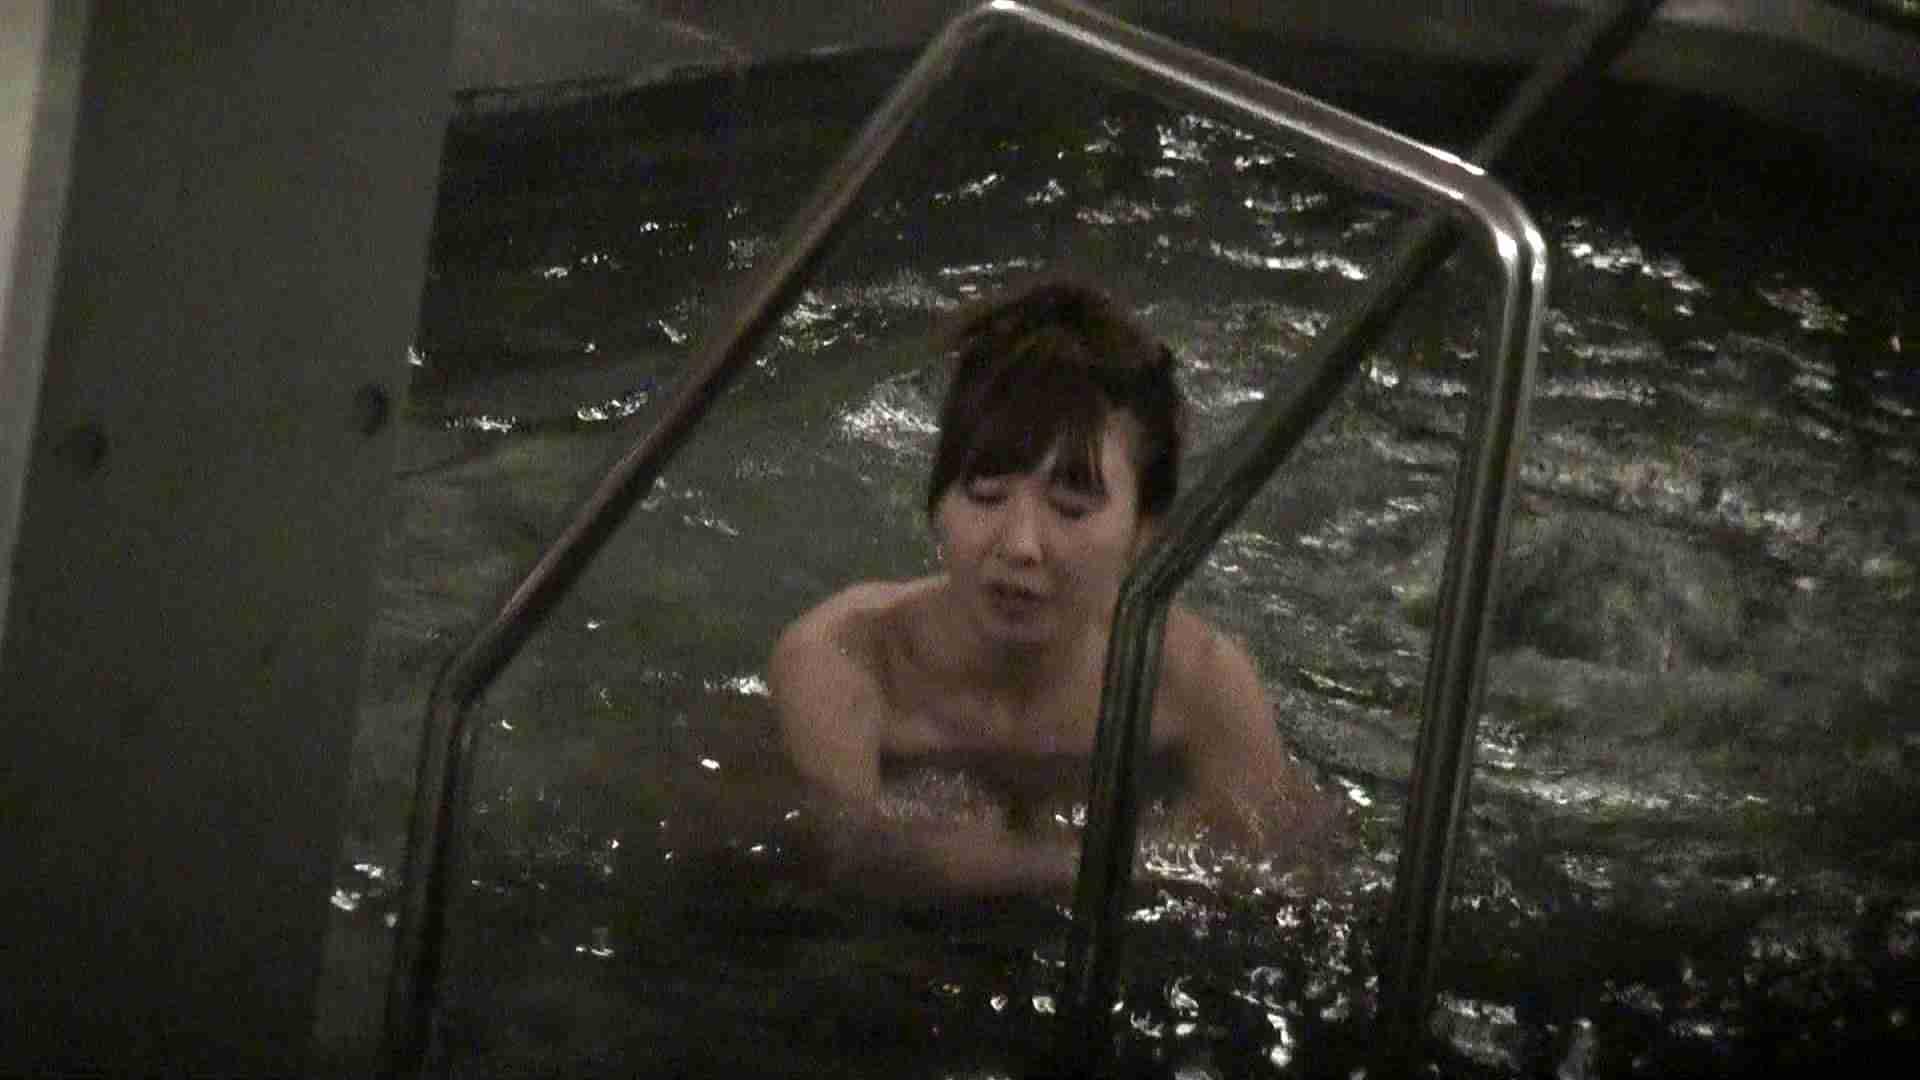 Aquaな露天風呂Vol.410 盗撮  73連発 33